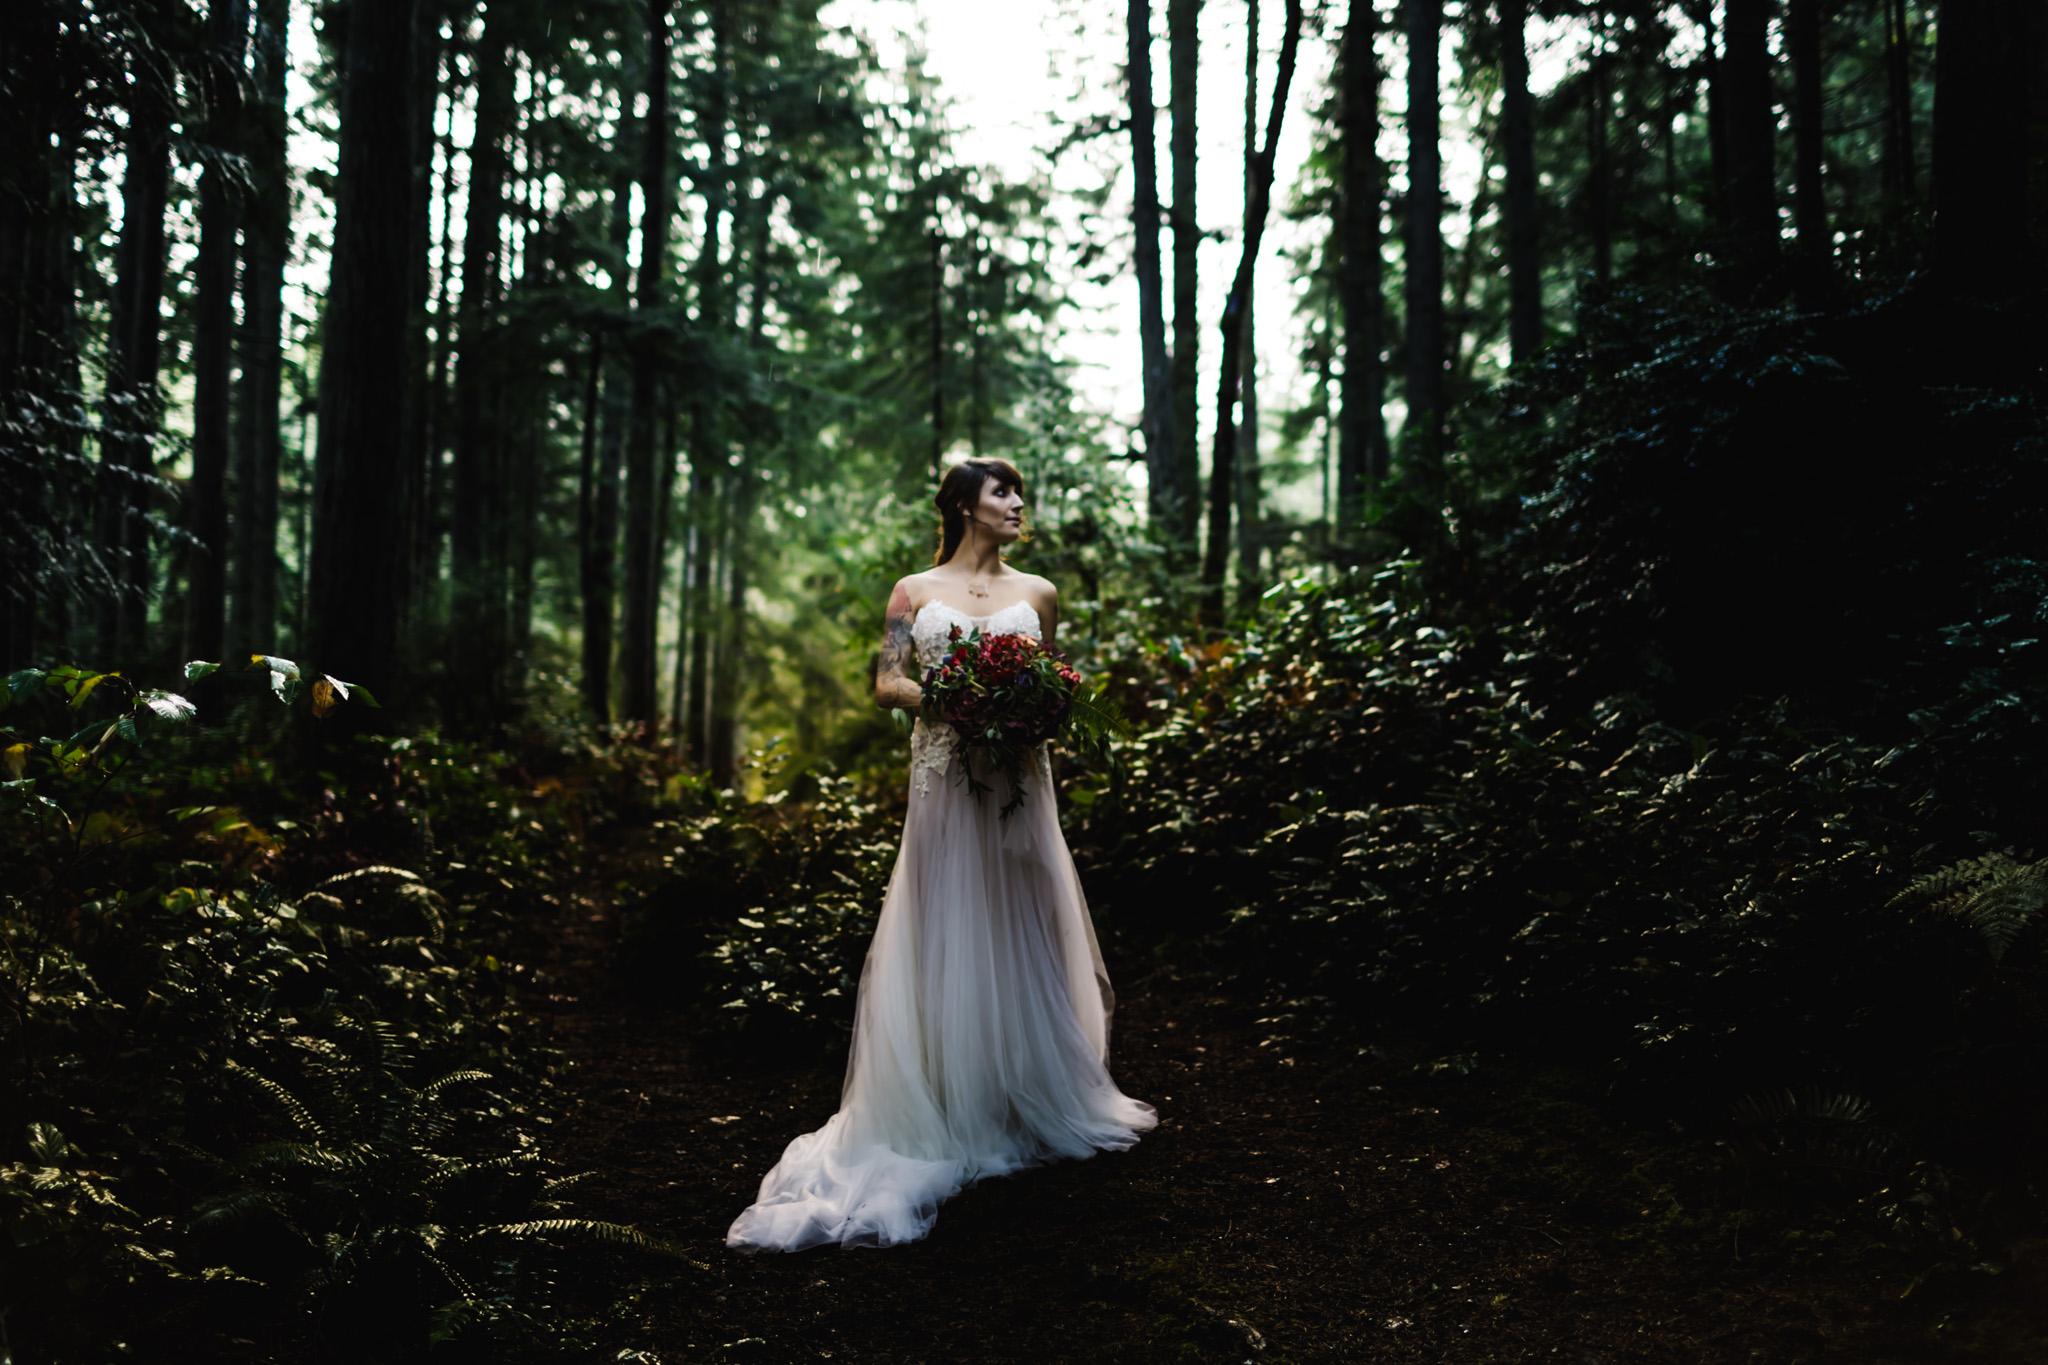 DannieMelissaWit_AbeillePhotography.com_BARE_Bridal_COLLABORATION-70.jpg